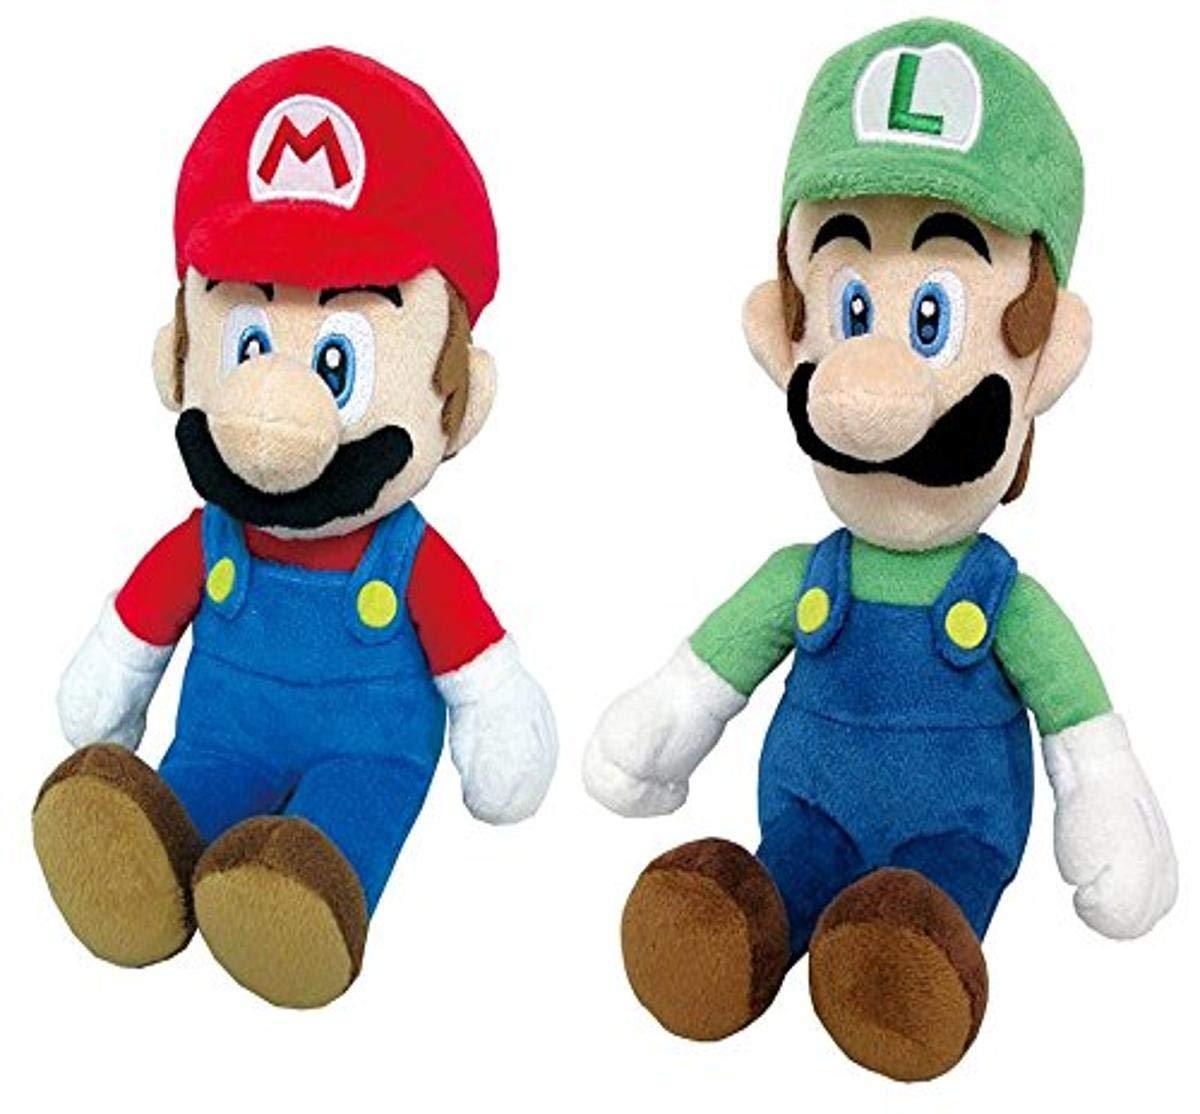 Little Buddy Set of 2 Super Mario All Star 1414 Mario & 1415 Luigi Stuffed Plush Dolls